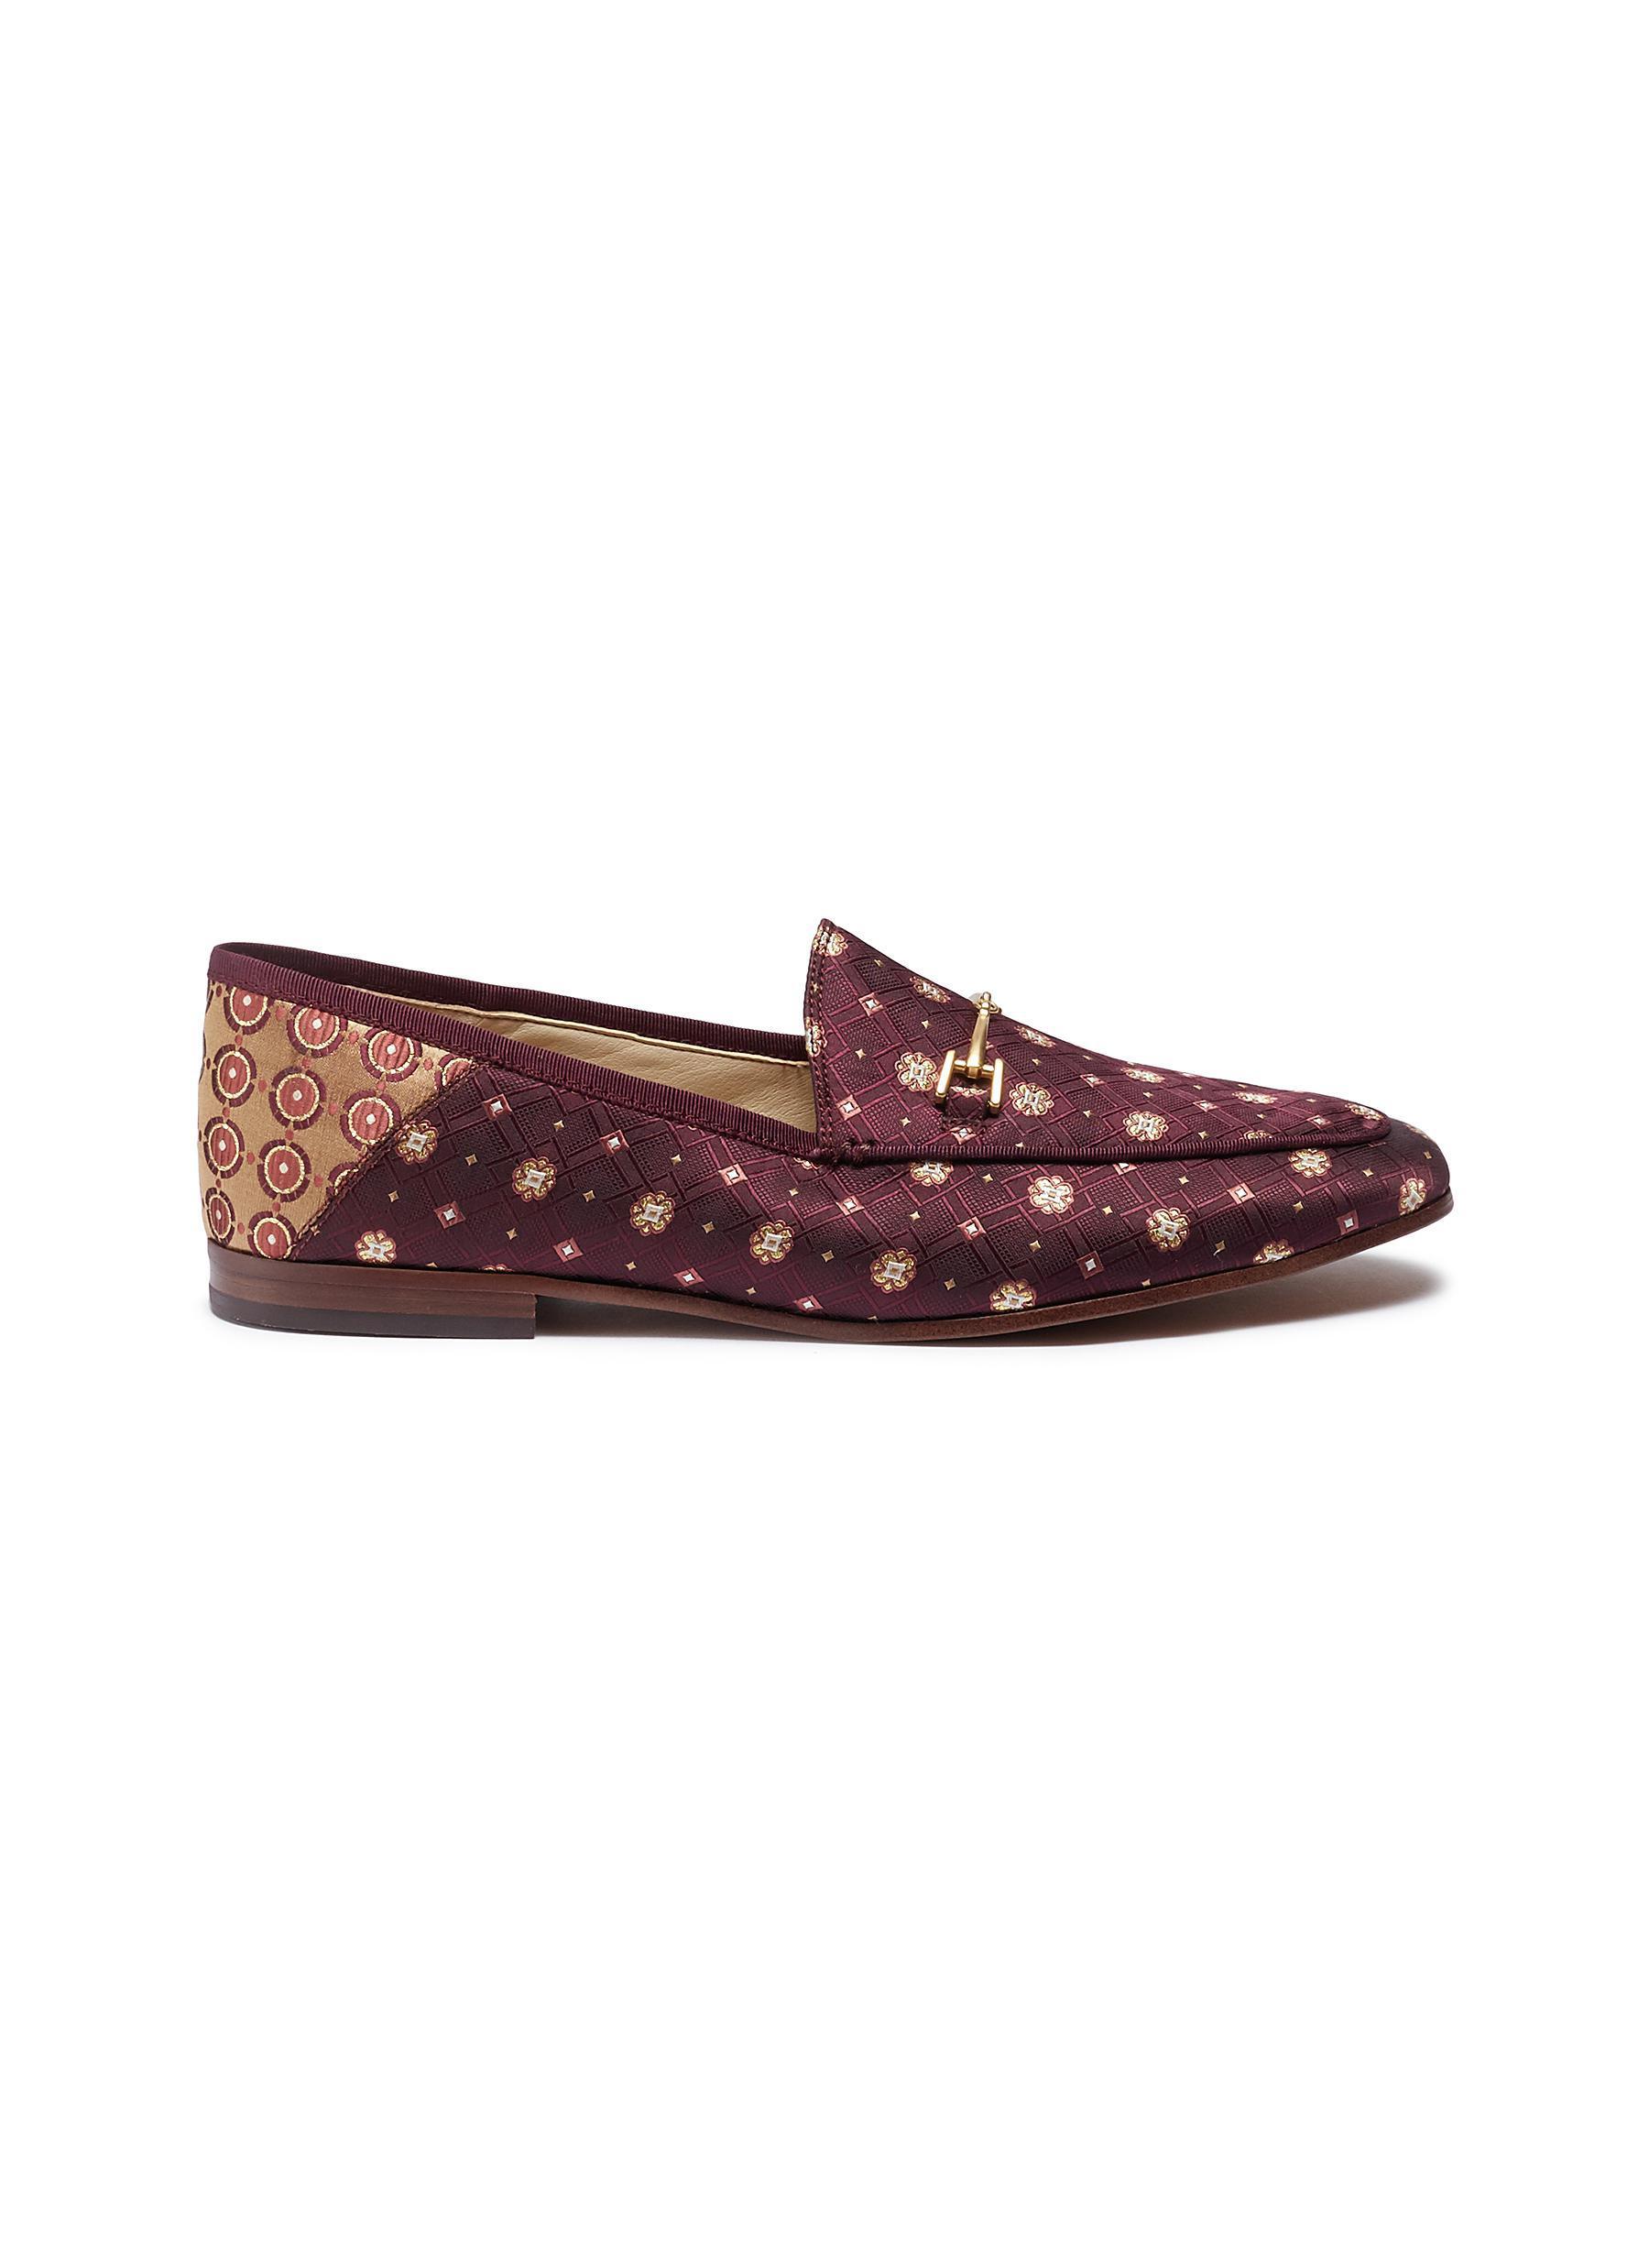 20e1d336235f Sam Edelman. Women s  loraine  Horsebit Geometric Jacquard Step-in Loafers